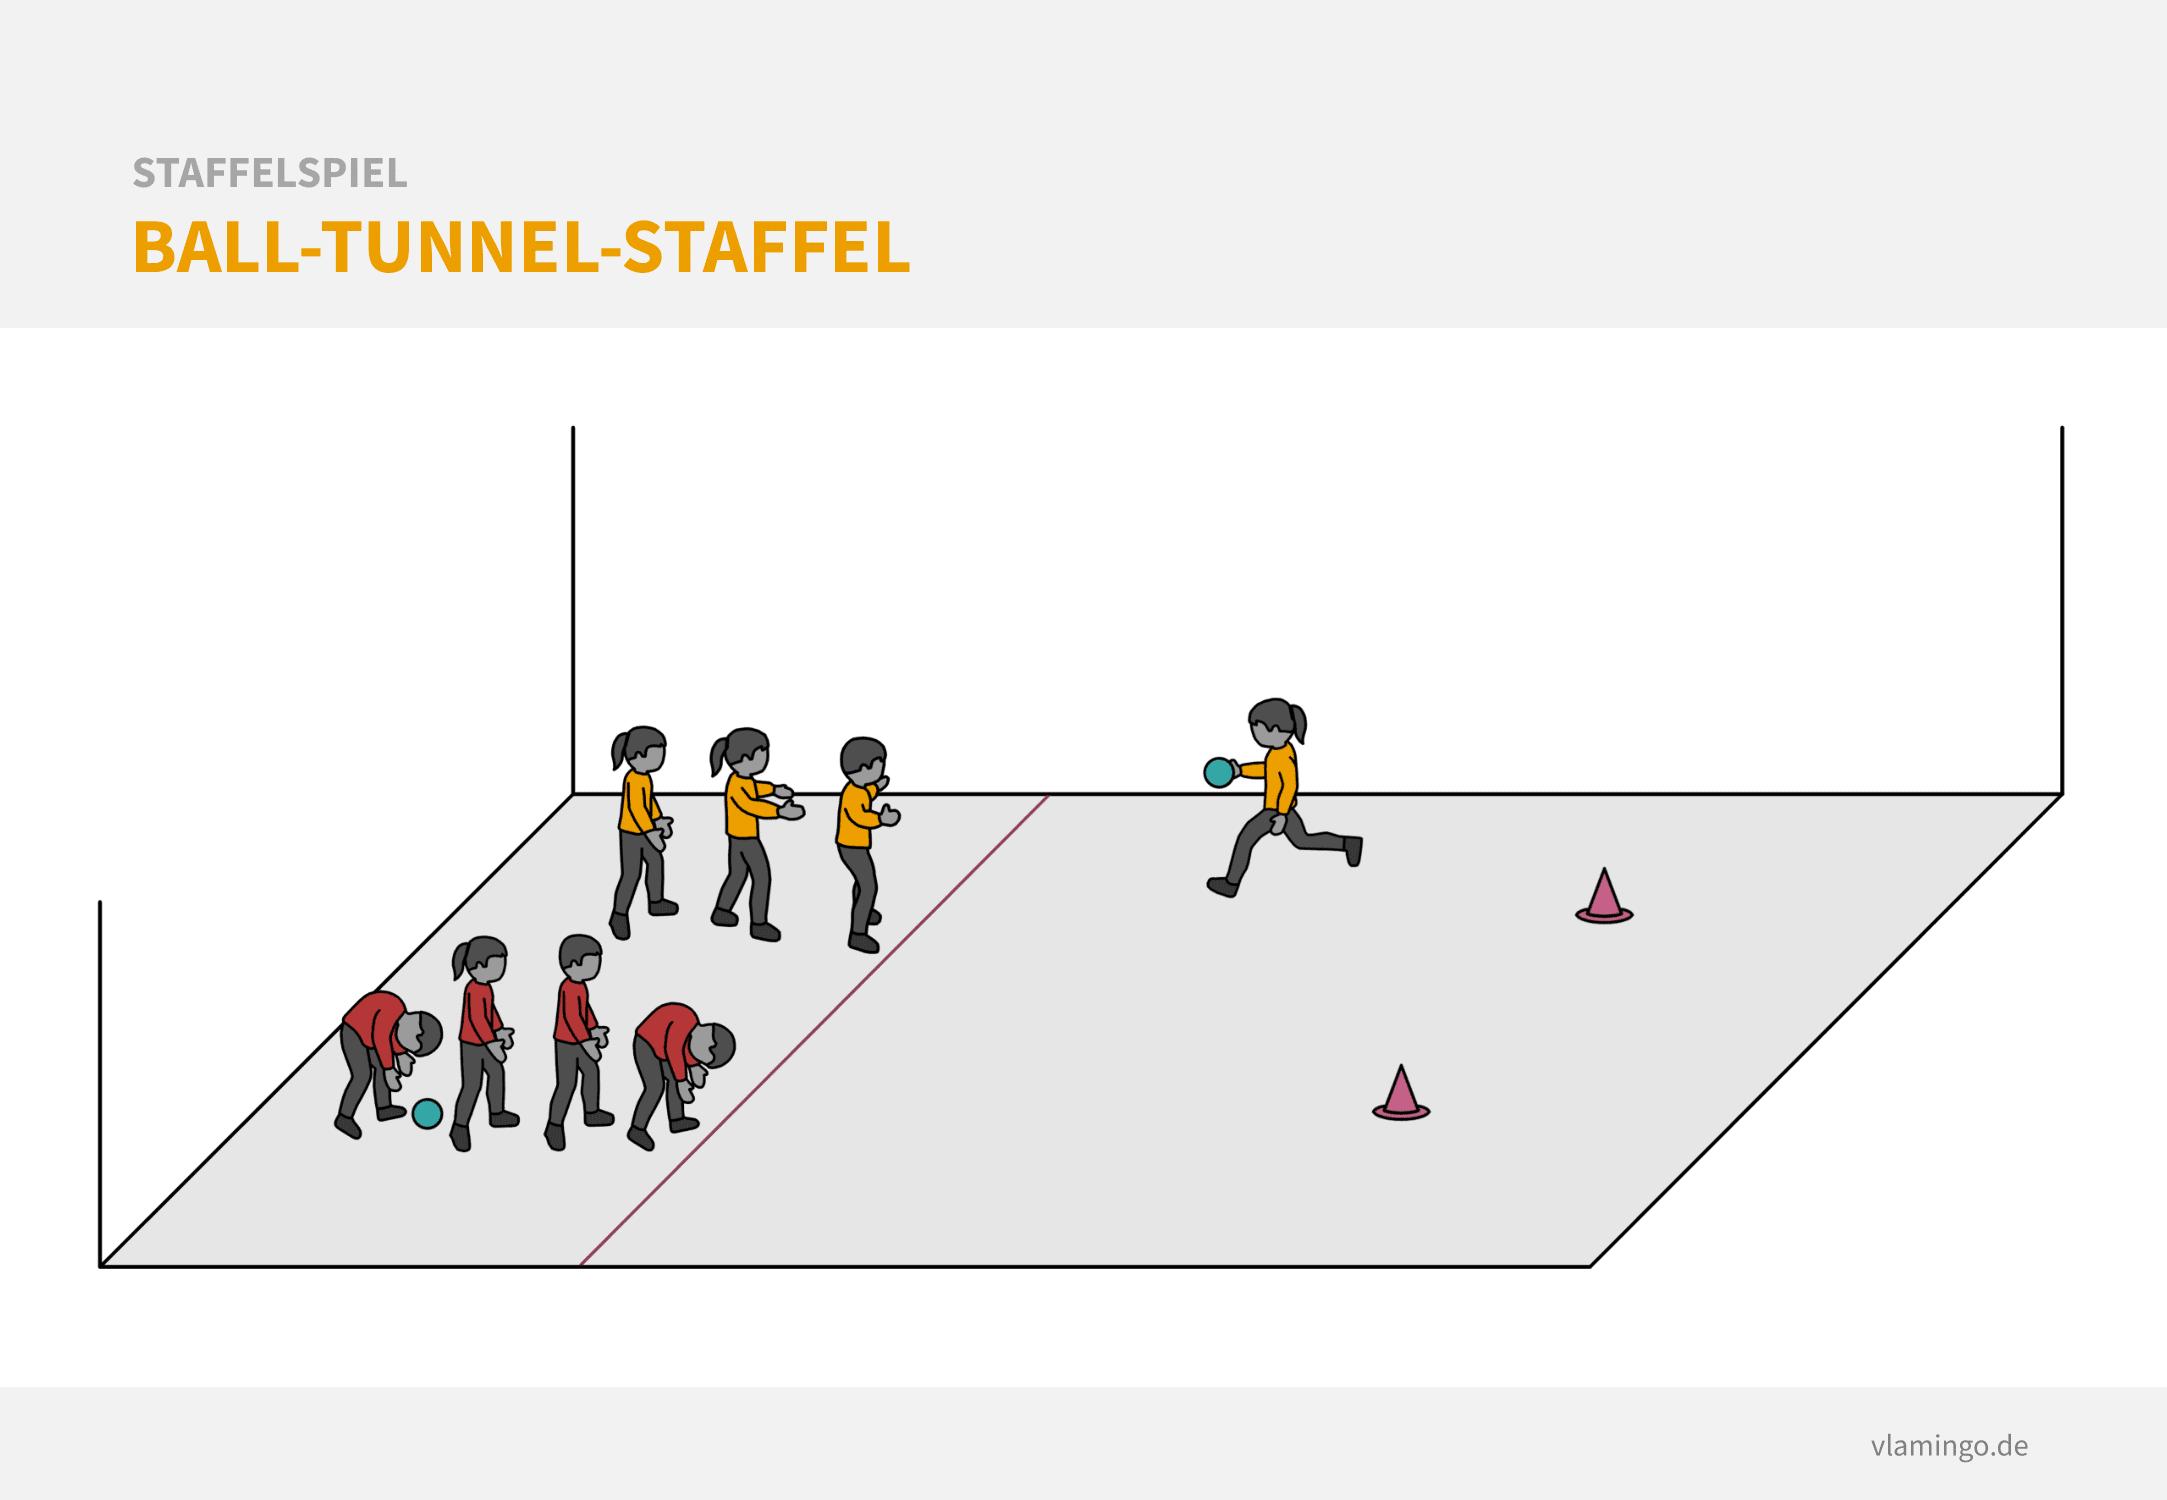 Staffelspiel - Ball-Tunnel-Staffel